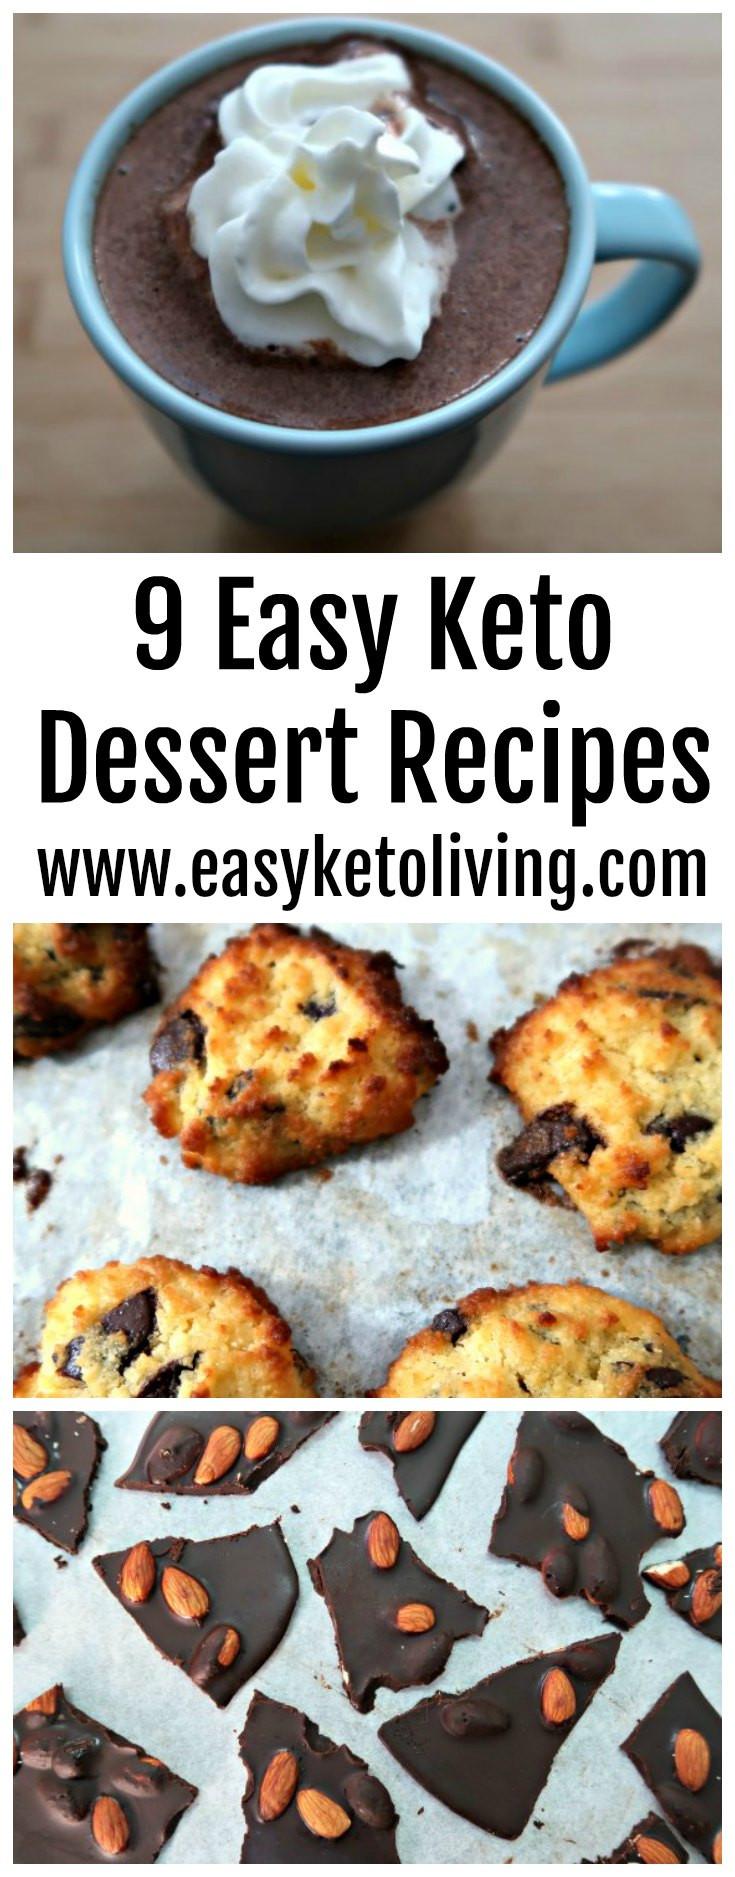 Quick Low Carb Desserts  9 Easy Keto Dessert Recipes Quick Low Carb Ketogenic